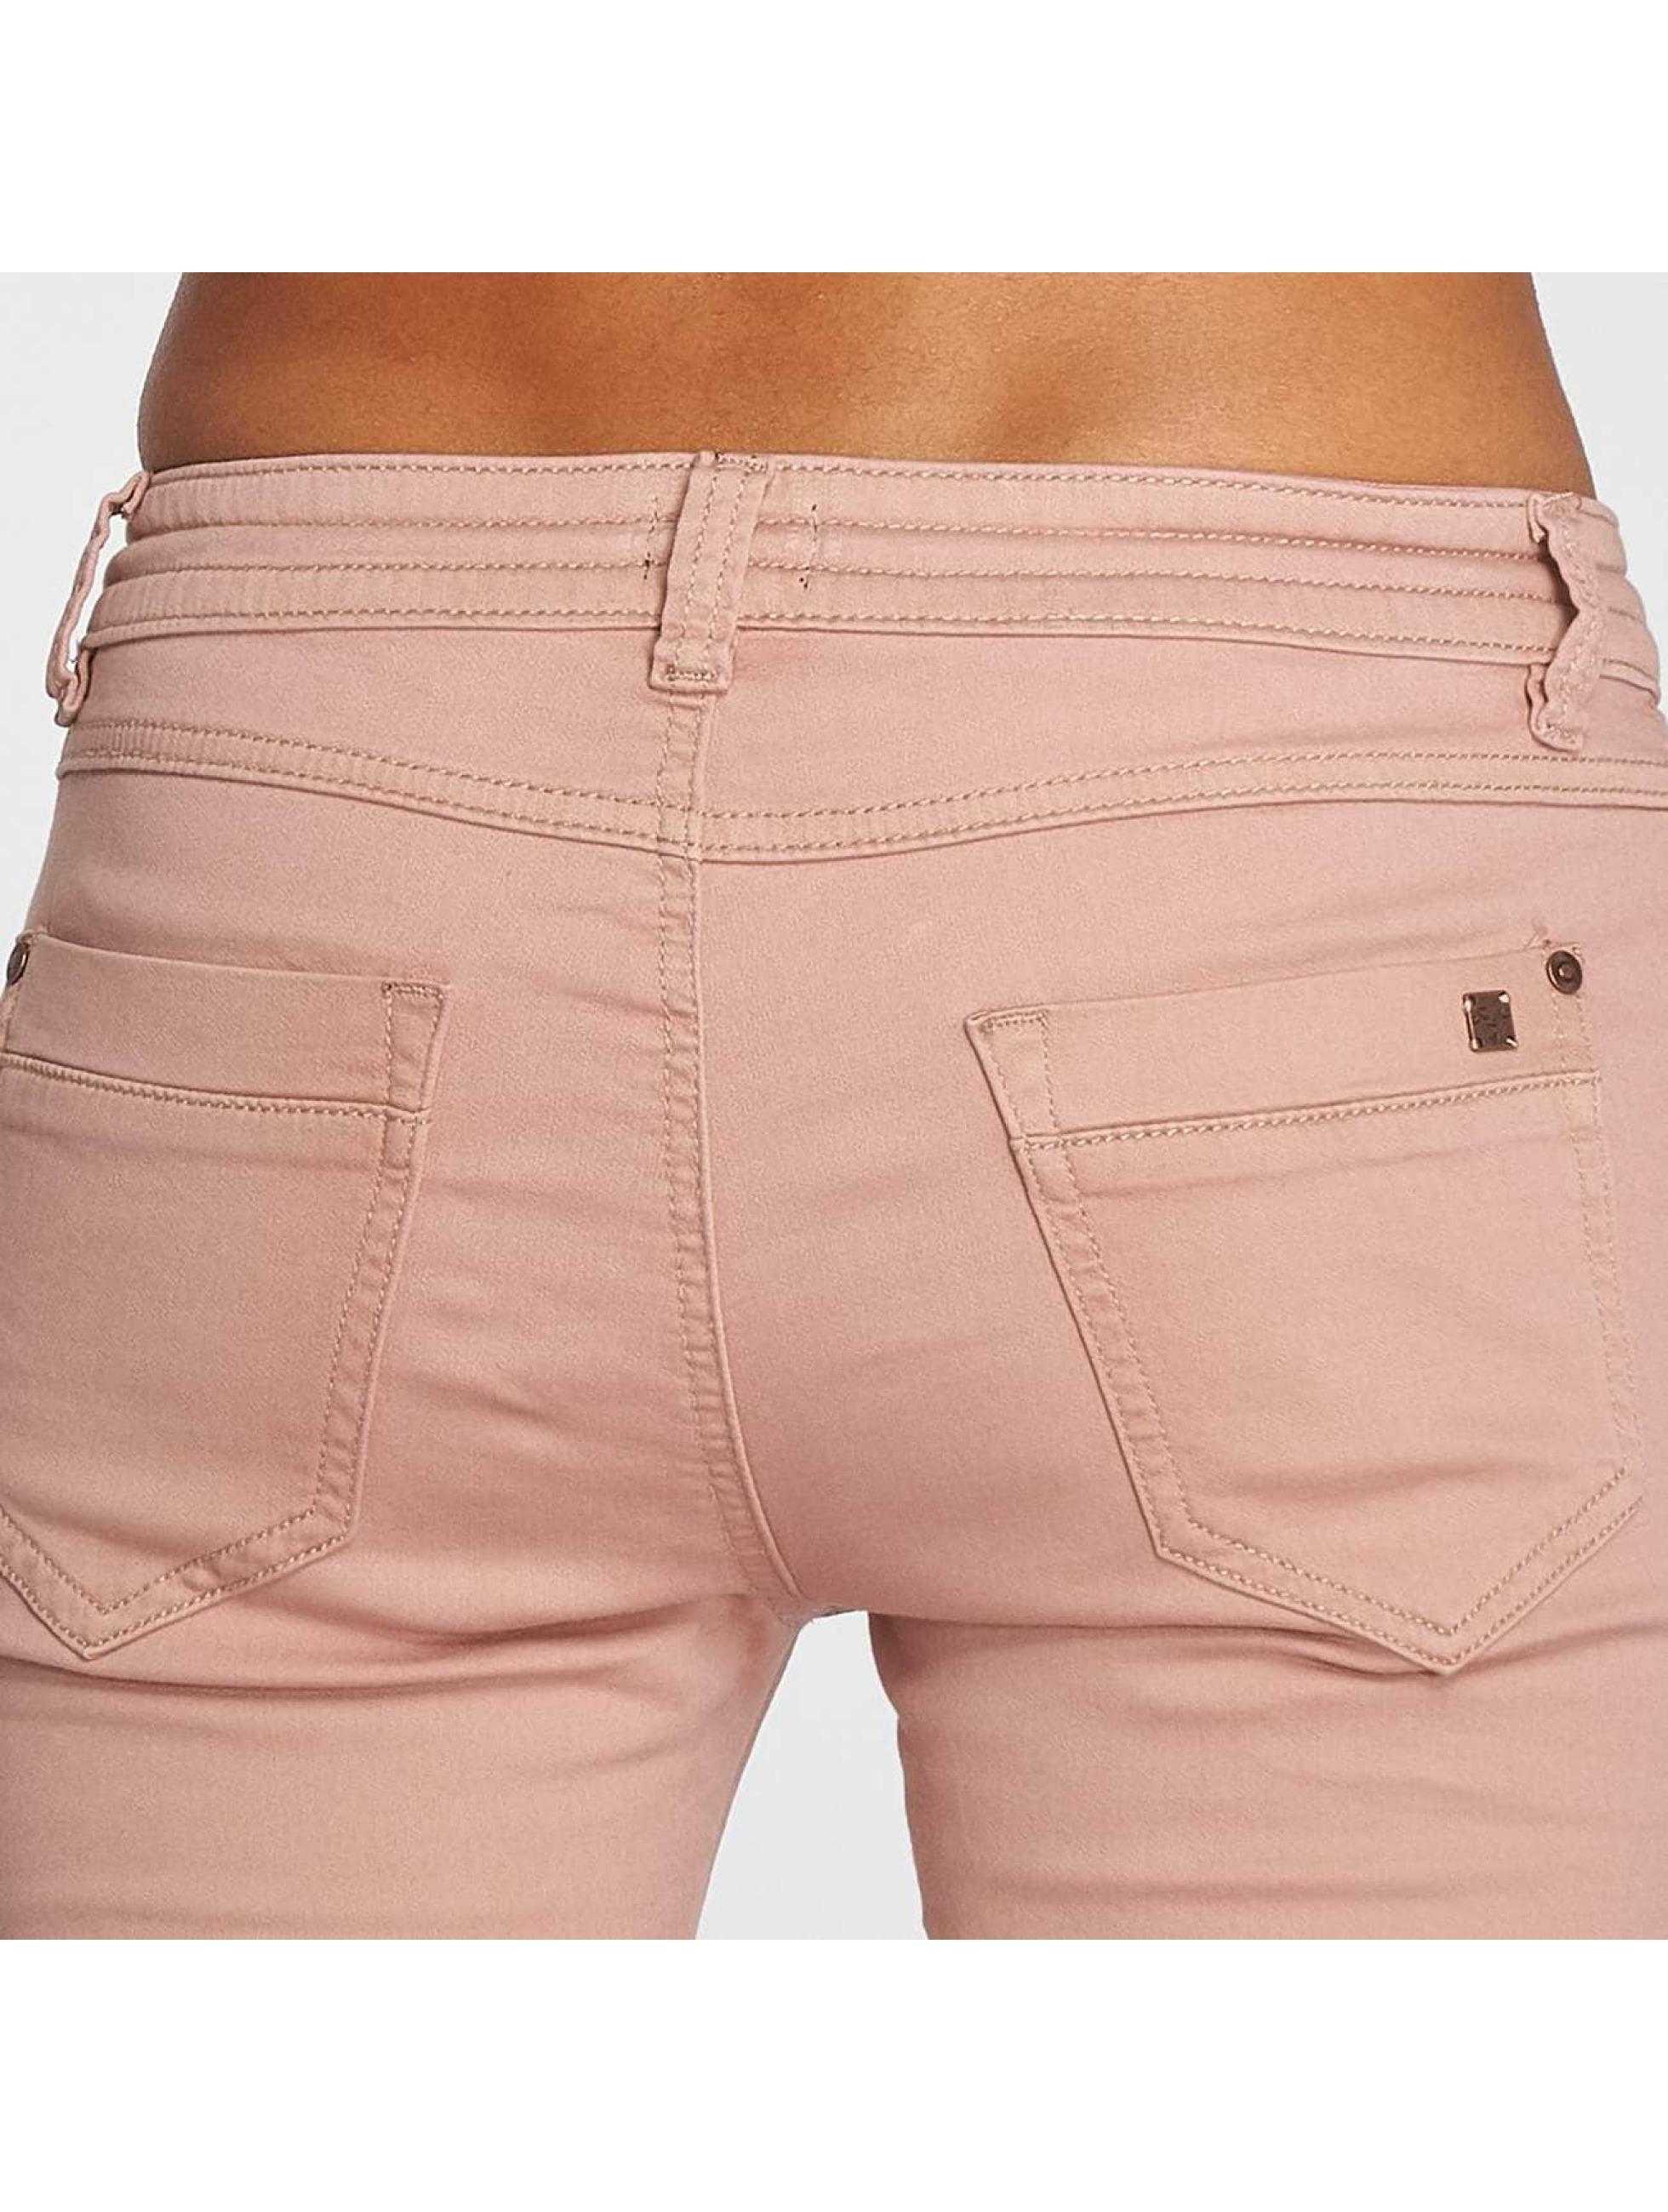 Fresh Made Spodnie do joggingu Capri Jogg rózowy